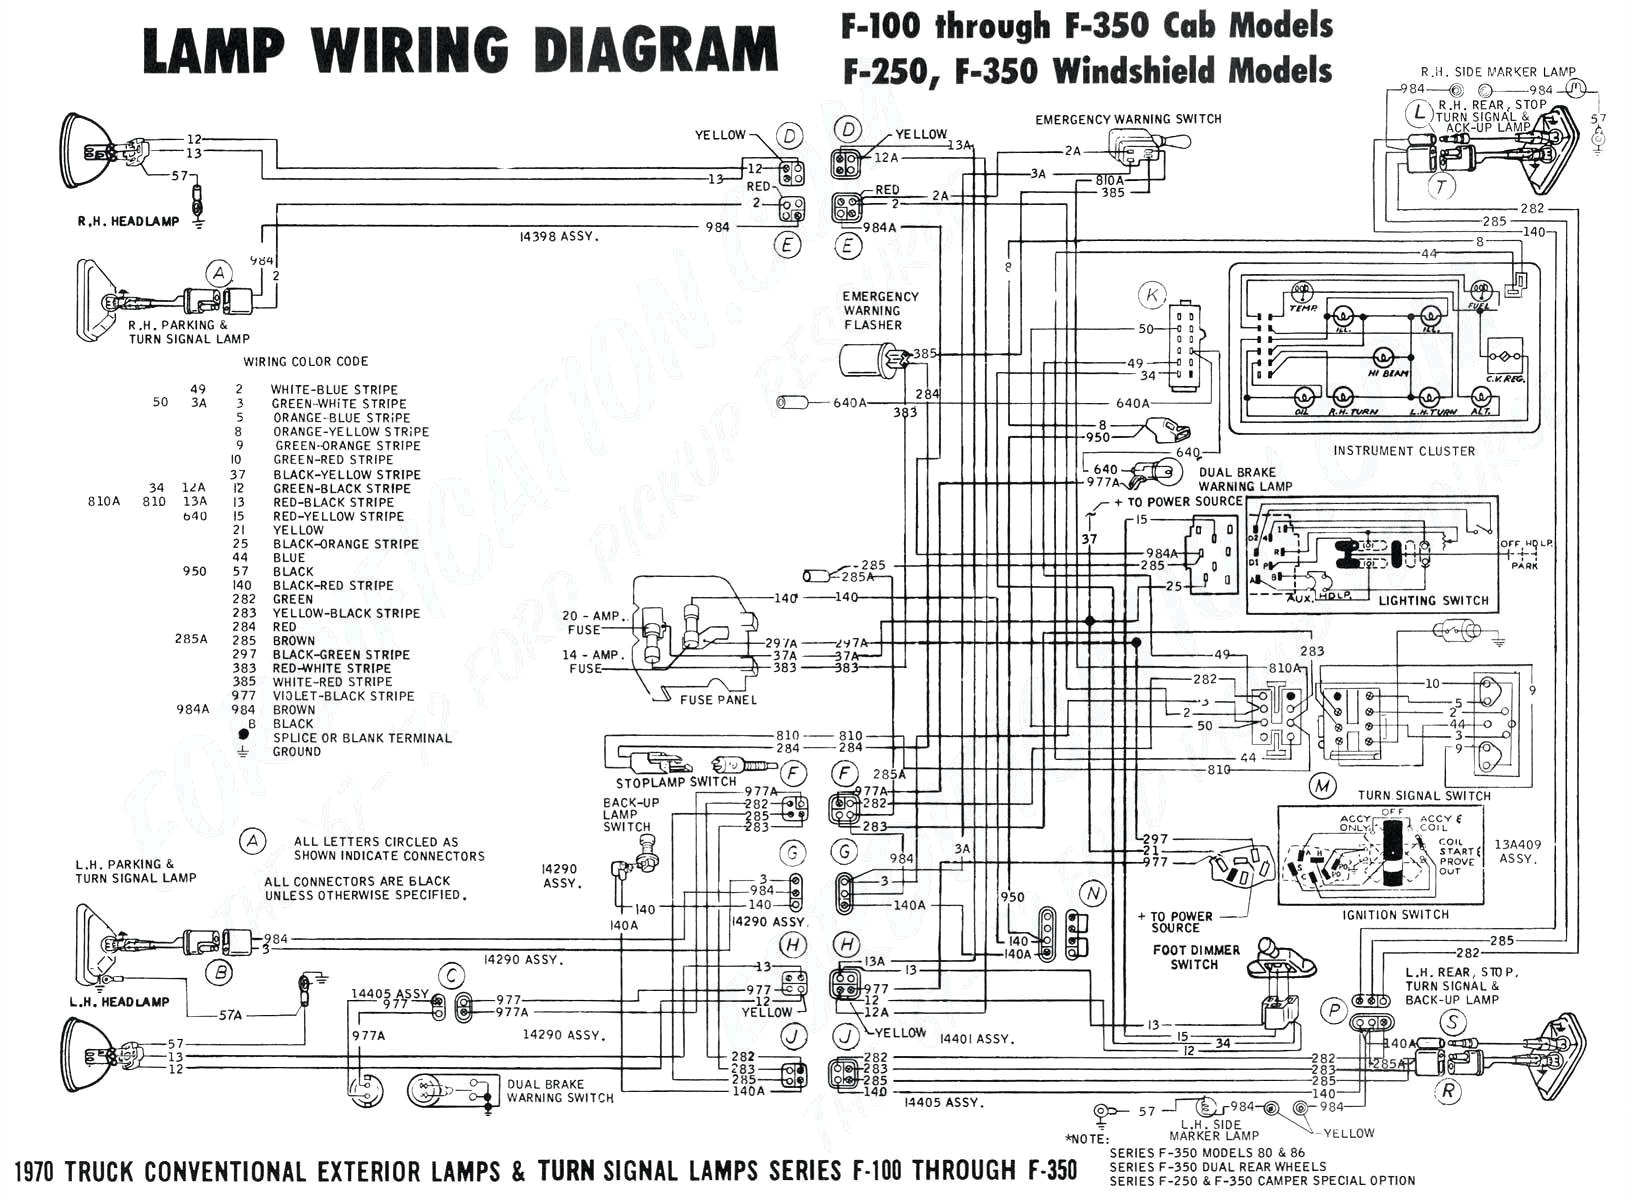 Car Lift Wiring Diagram Master Lift Wiring Diagram Wiring Diagram Technic